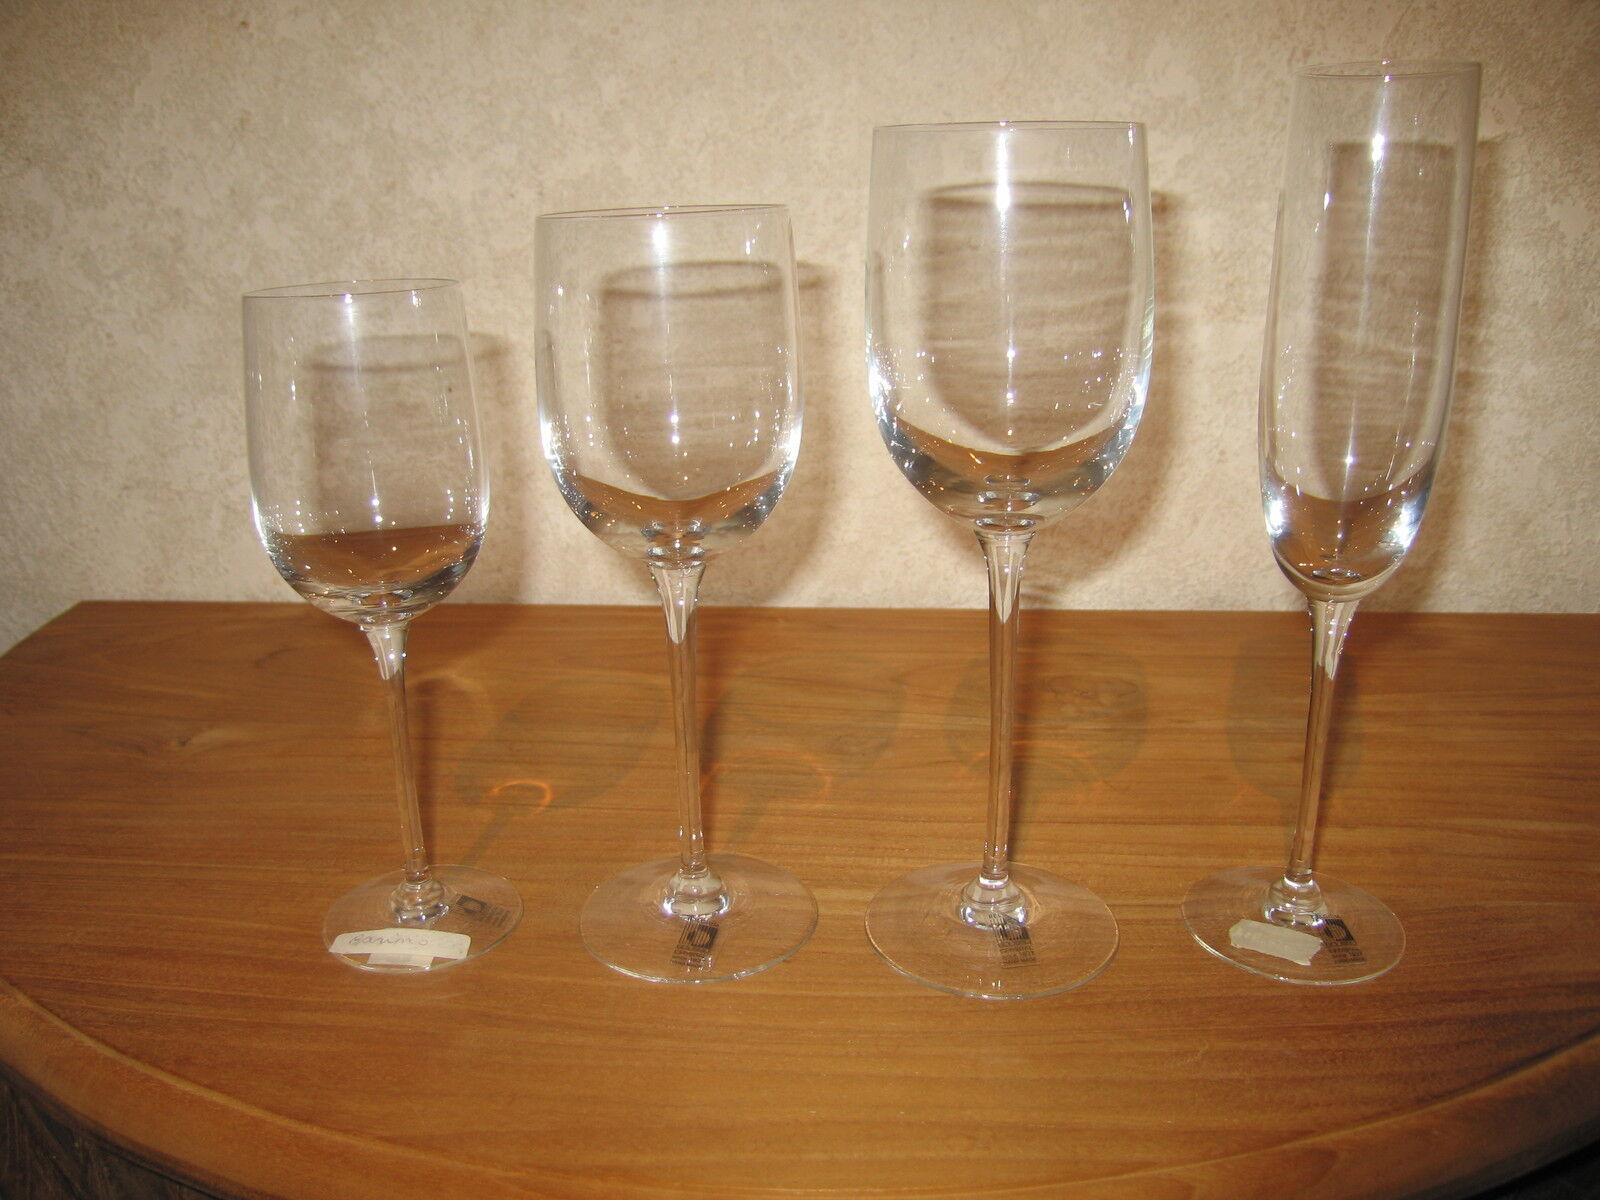 BOUSSU NEW CASINO Set 4 Verres Glasses